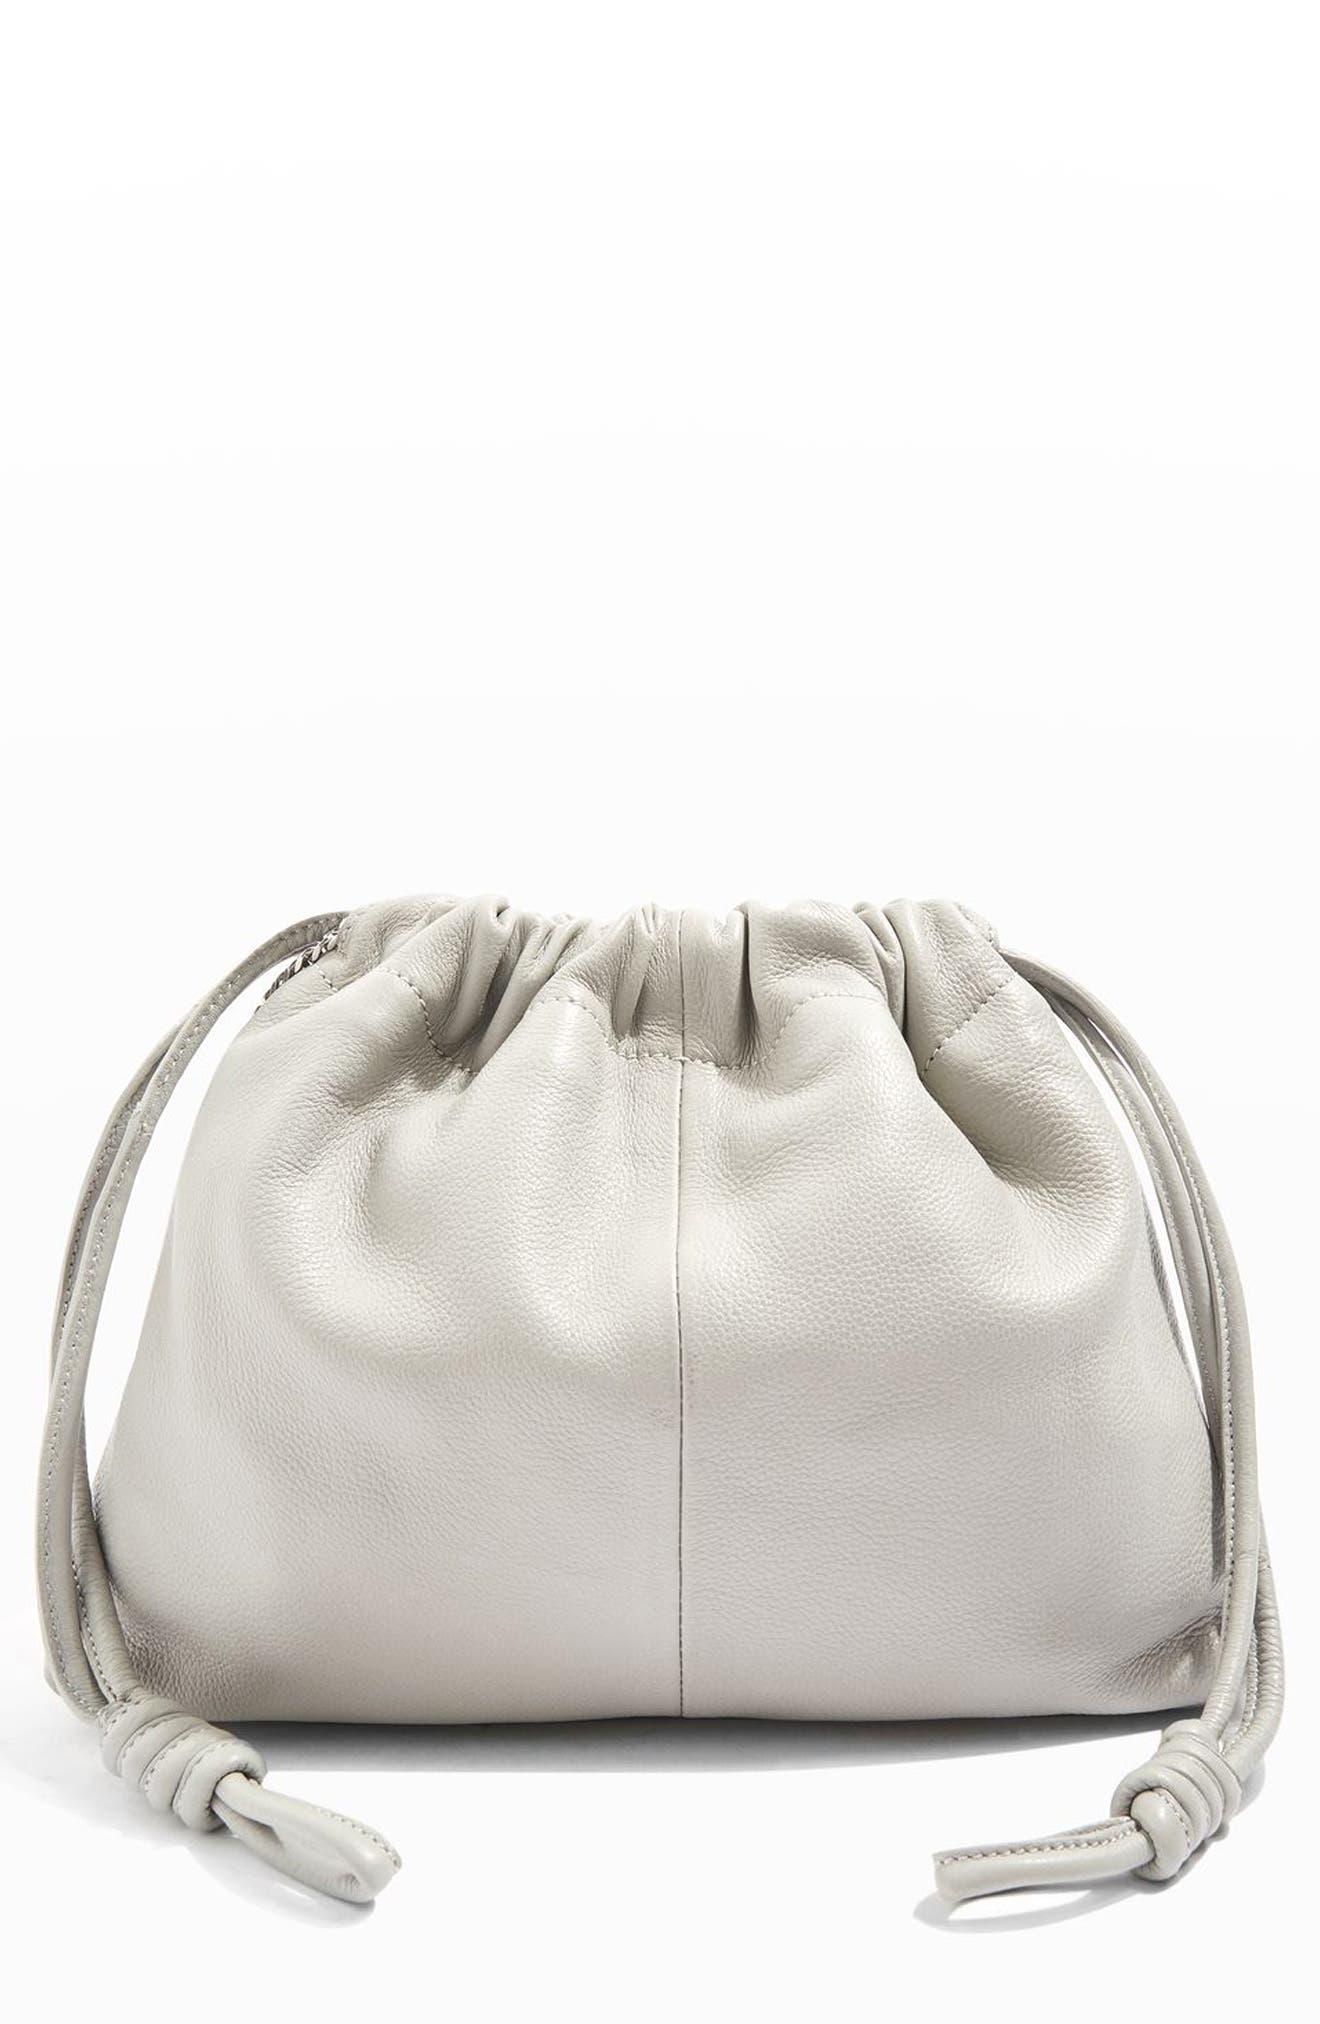 Main Image - Topshop Premium Leather Drawstring Crossbody Bag